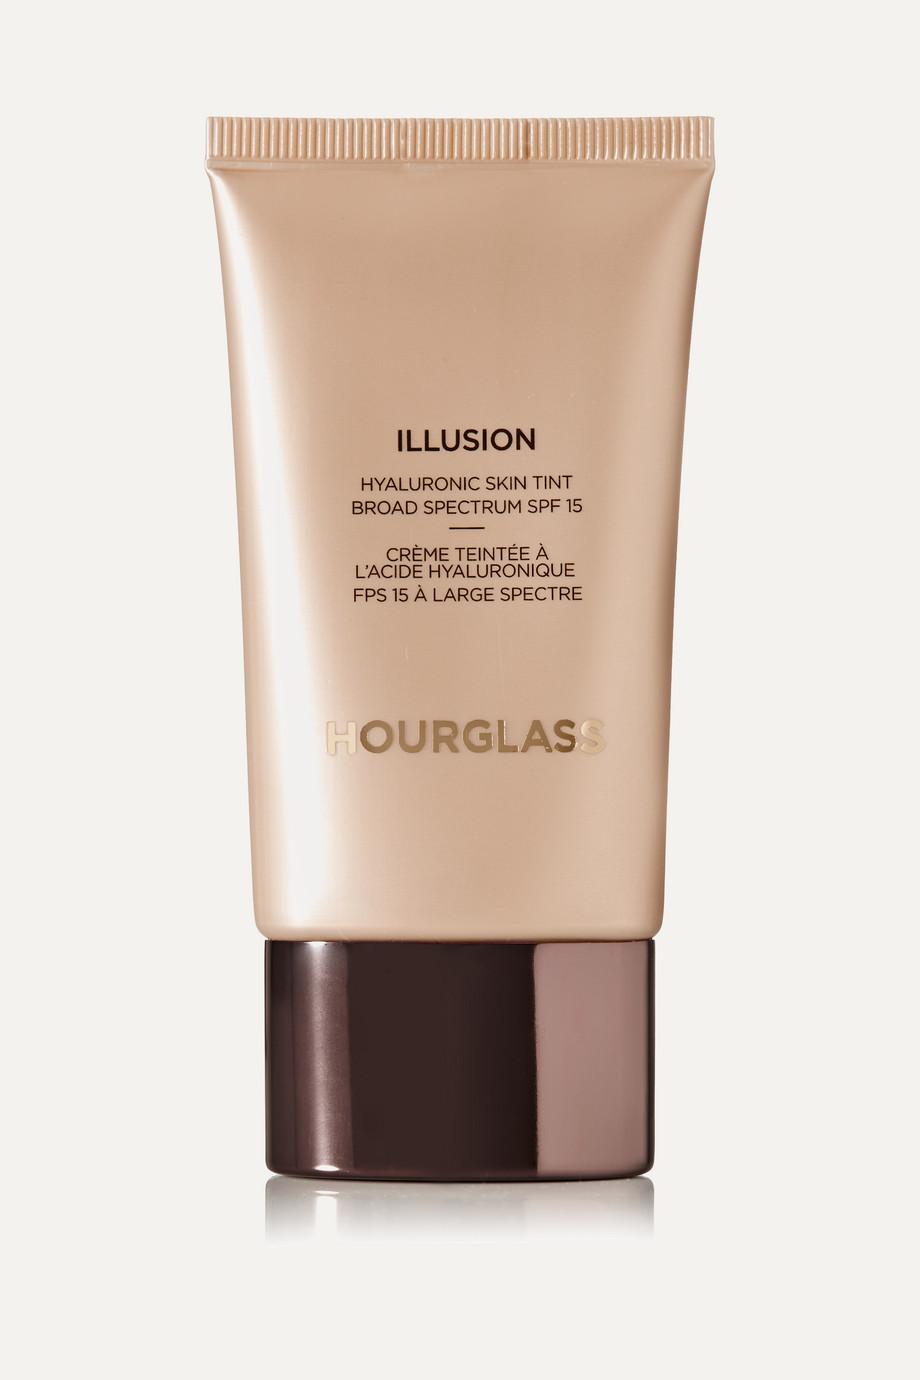 Hourglass Illusion® Hyaluronic Skin Tint SPF15 - Light Beige, 30ml